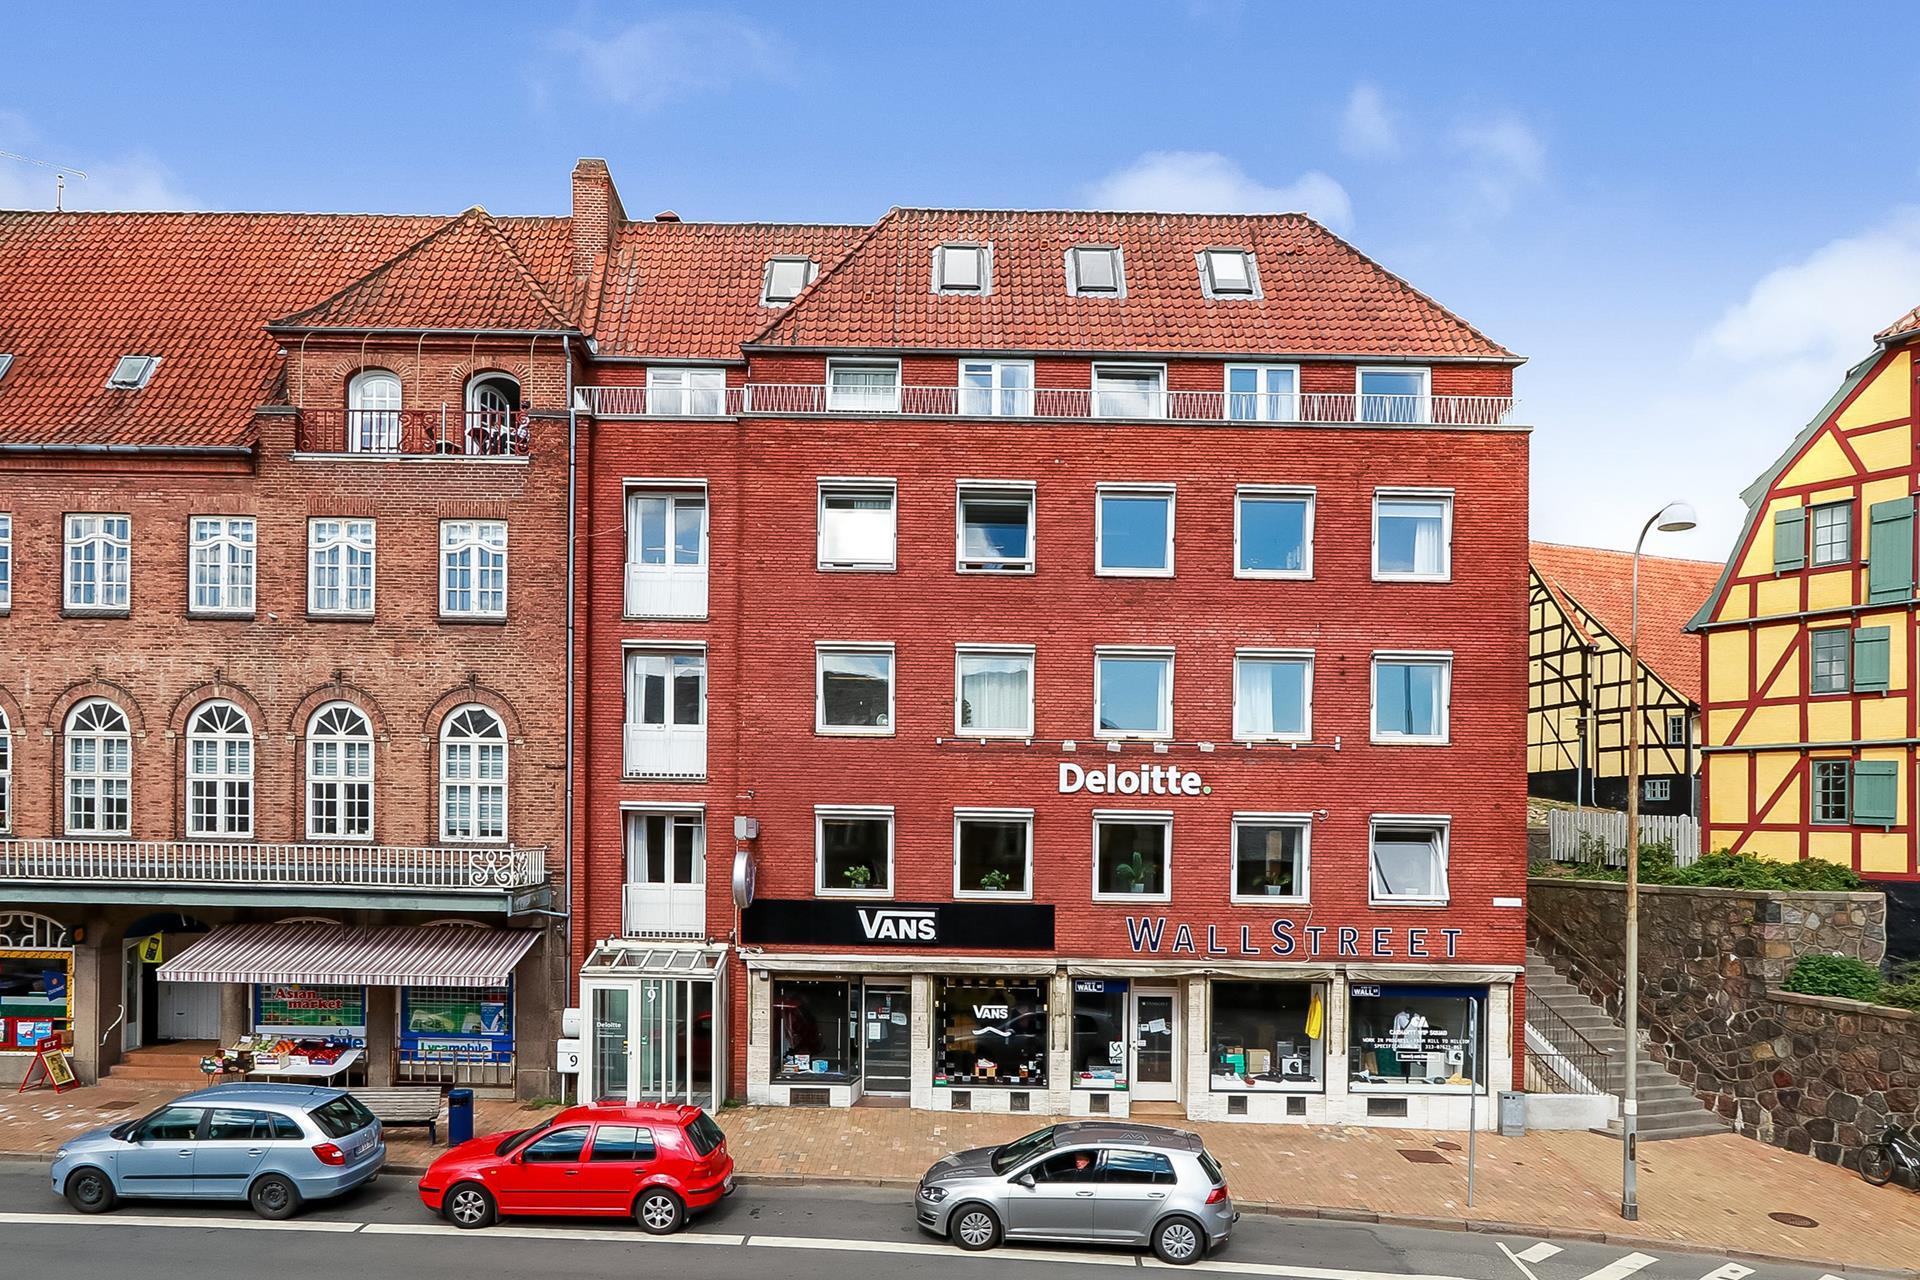 Bolig/erhverv på Klosterplads i Svendborg - Ejendommen